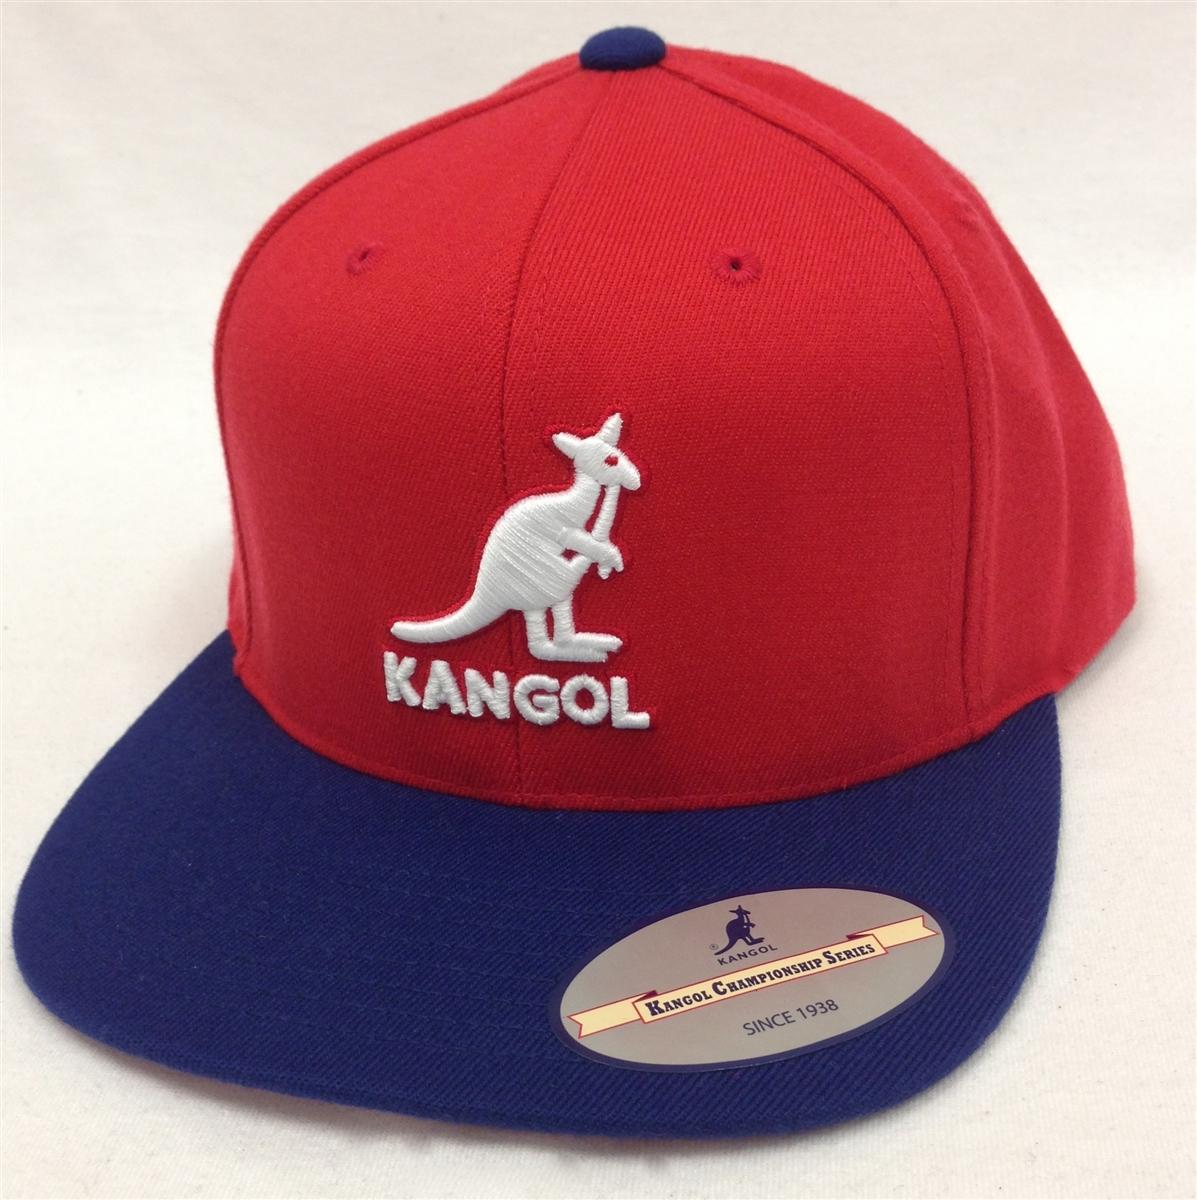 Kangol Championship Links Red   Blue Snapback 4cfe4ad1dae5